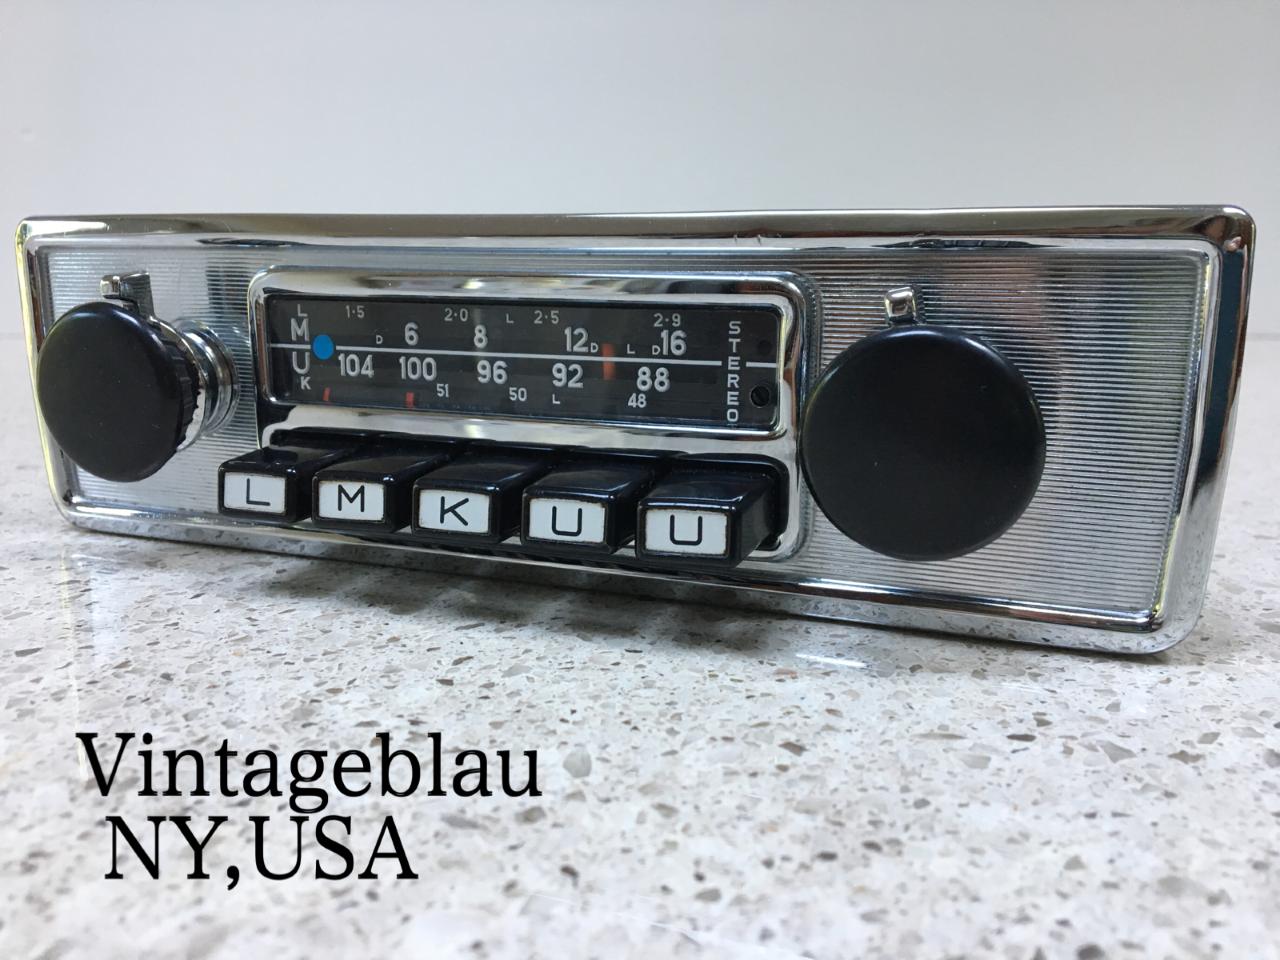 vintageblau classic car radios - vintage blaupunkt radios for classic  porsche jaguar and mercedes